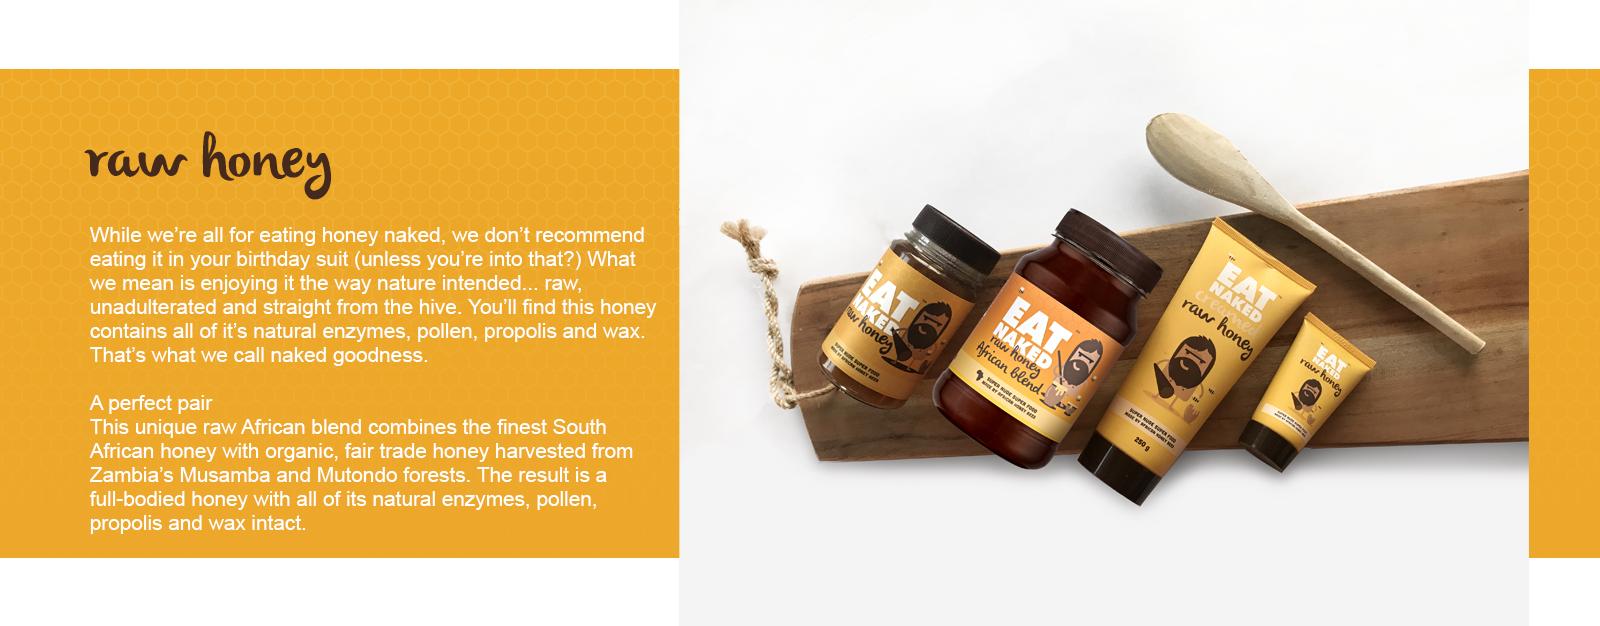 Product-1-raw honey-